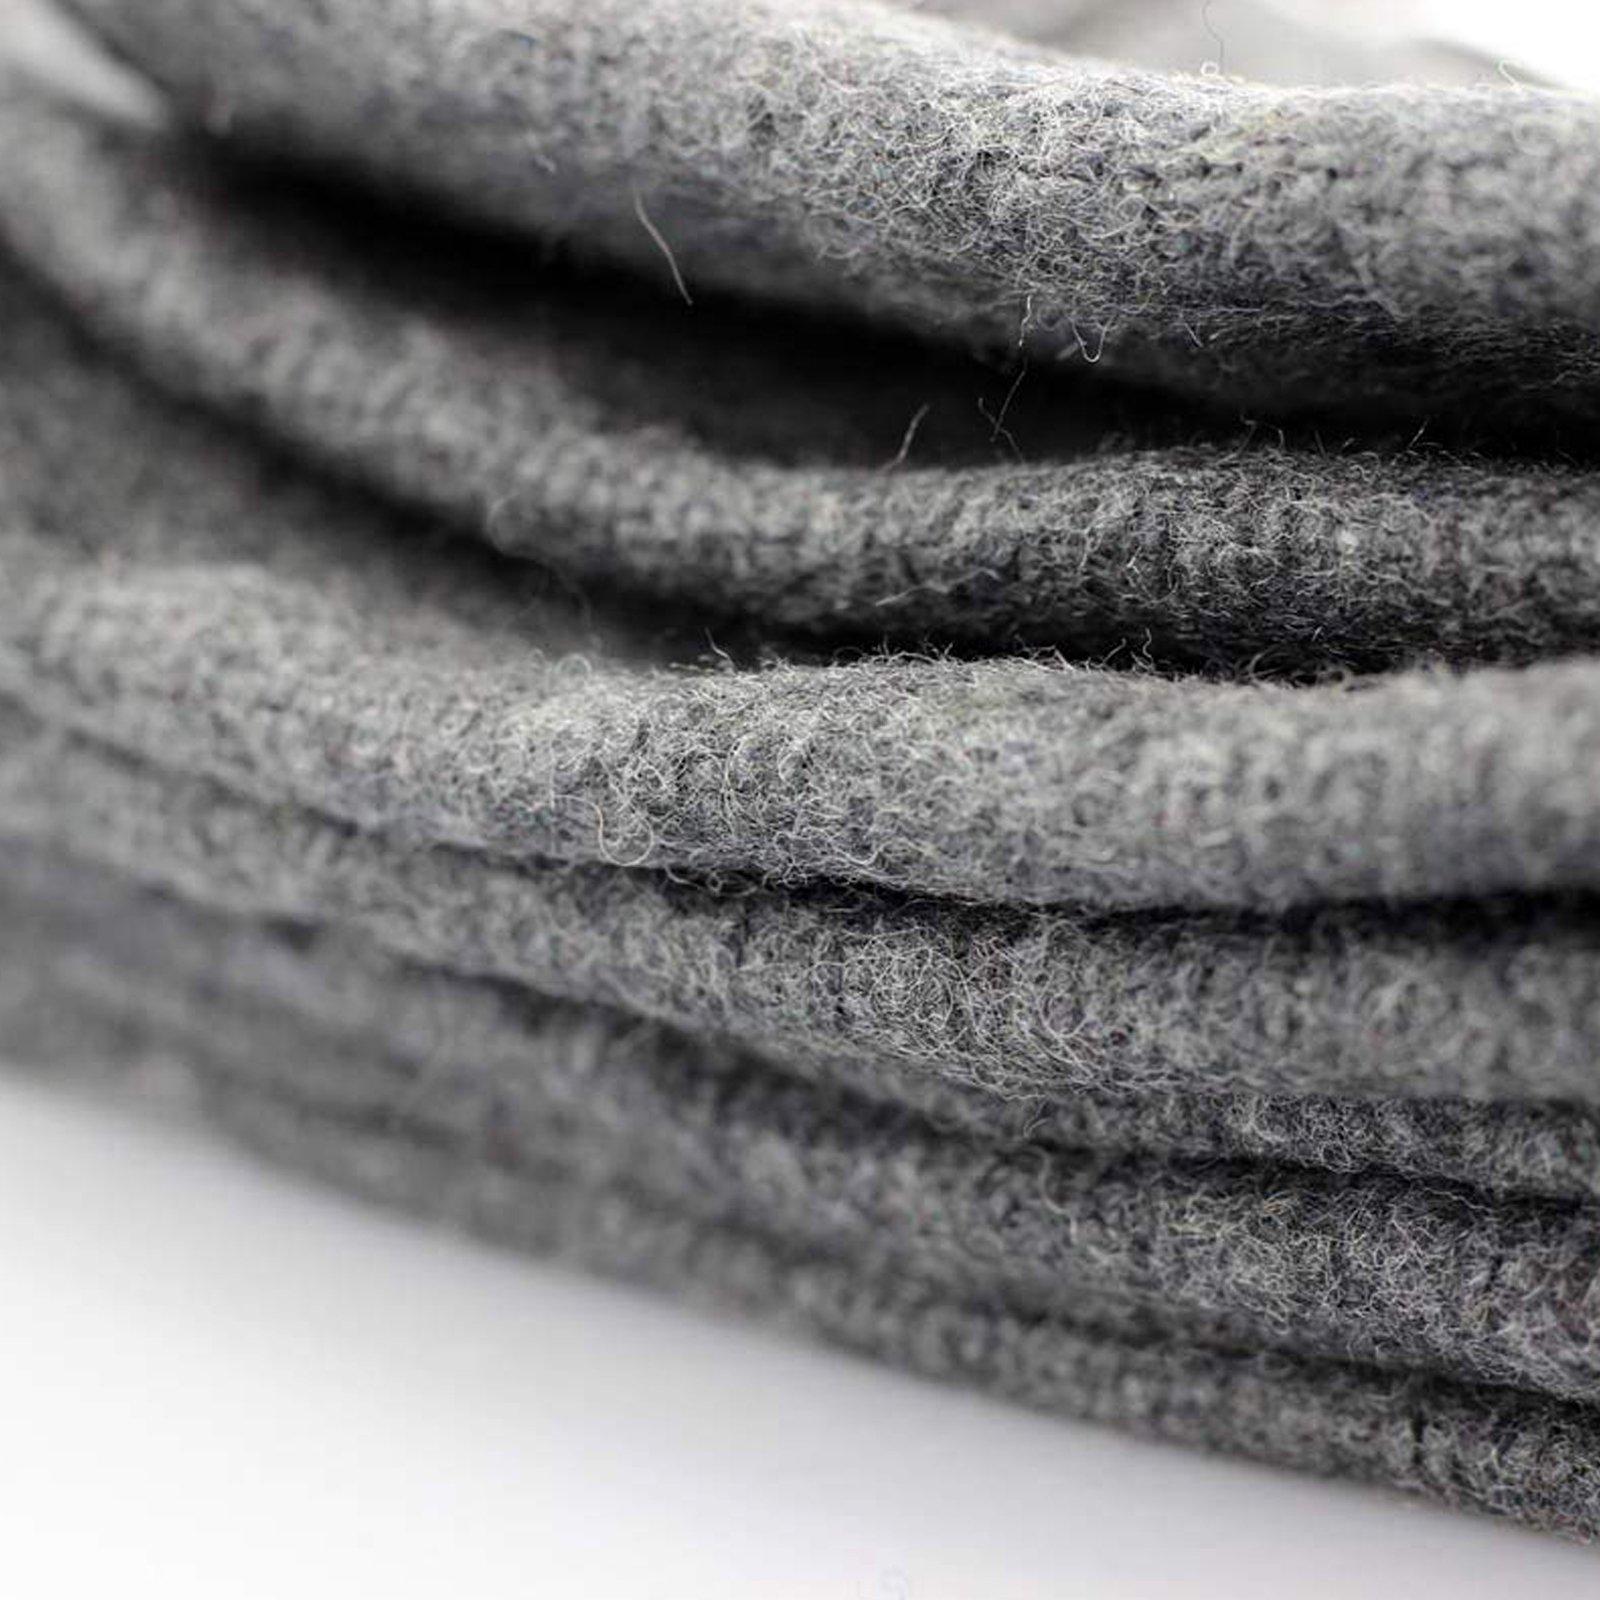 ASR Outdoor - 51 inch x 80 inch Gray Wool Blanket - 2lbs - 50 Percent Wool